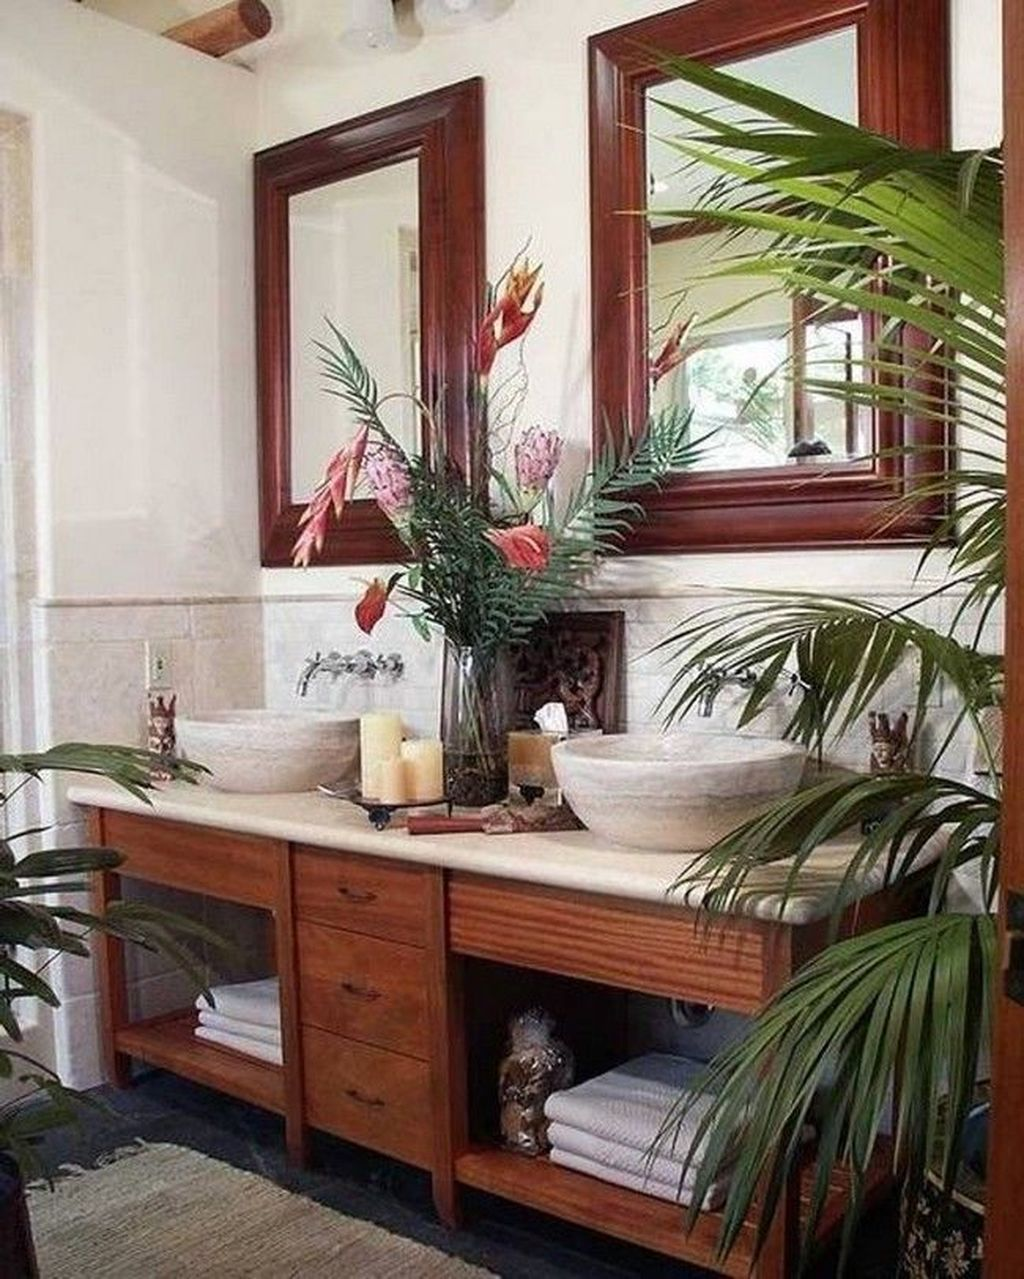 5 Gorgeous Scandinavian Bathroom Ideas: 33 Beautiful Jungle Themed Bathroom Decor Ideas